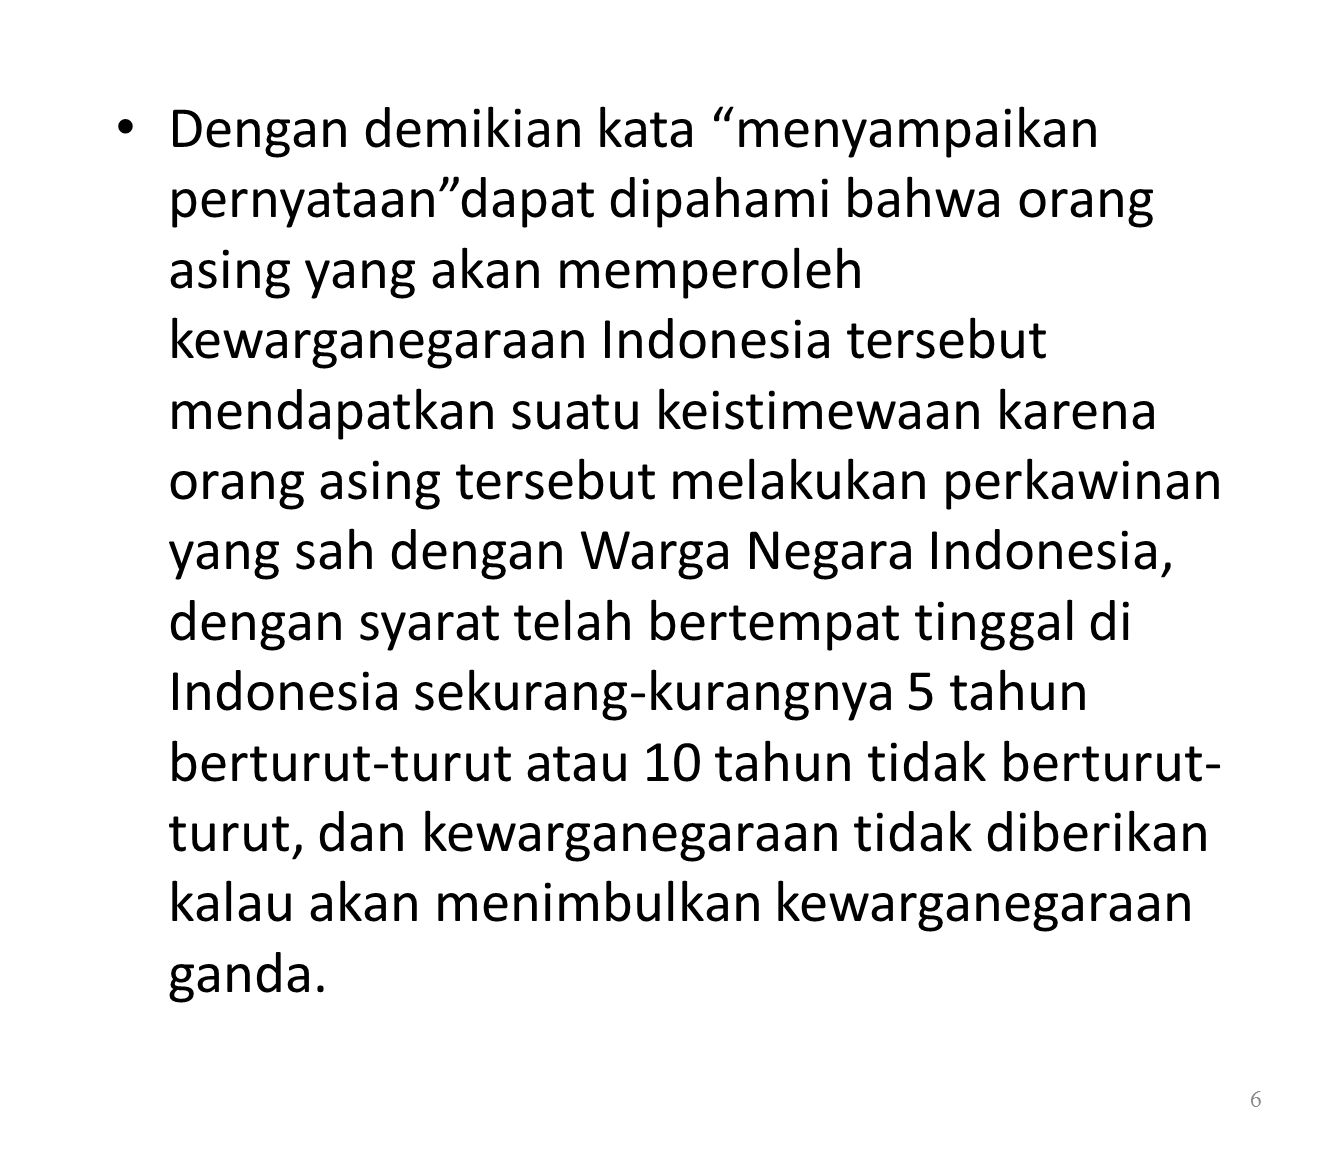 Dengan demikian kata menyampaikan pernyataan dapat dipahami bahwa orang asing yang akan memperoleh kewarganegaraan Indonesia tersebut mendapatkan suatu keistimewaan karena orang asing tersebut melakukan perkawinan yang sah dengan Warga Negara Indonesia, dengan syarat telah bertempat tinggal di Indonesia sekurang-kurangnya 5 tahun berturut-turut atau 10 tahun tidak berturut-turut, dan kewarganegaraan tidak diberikan kalau akan menimbulkan kewarganegaraan ganda.